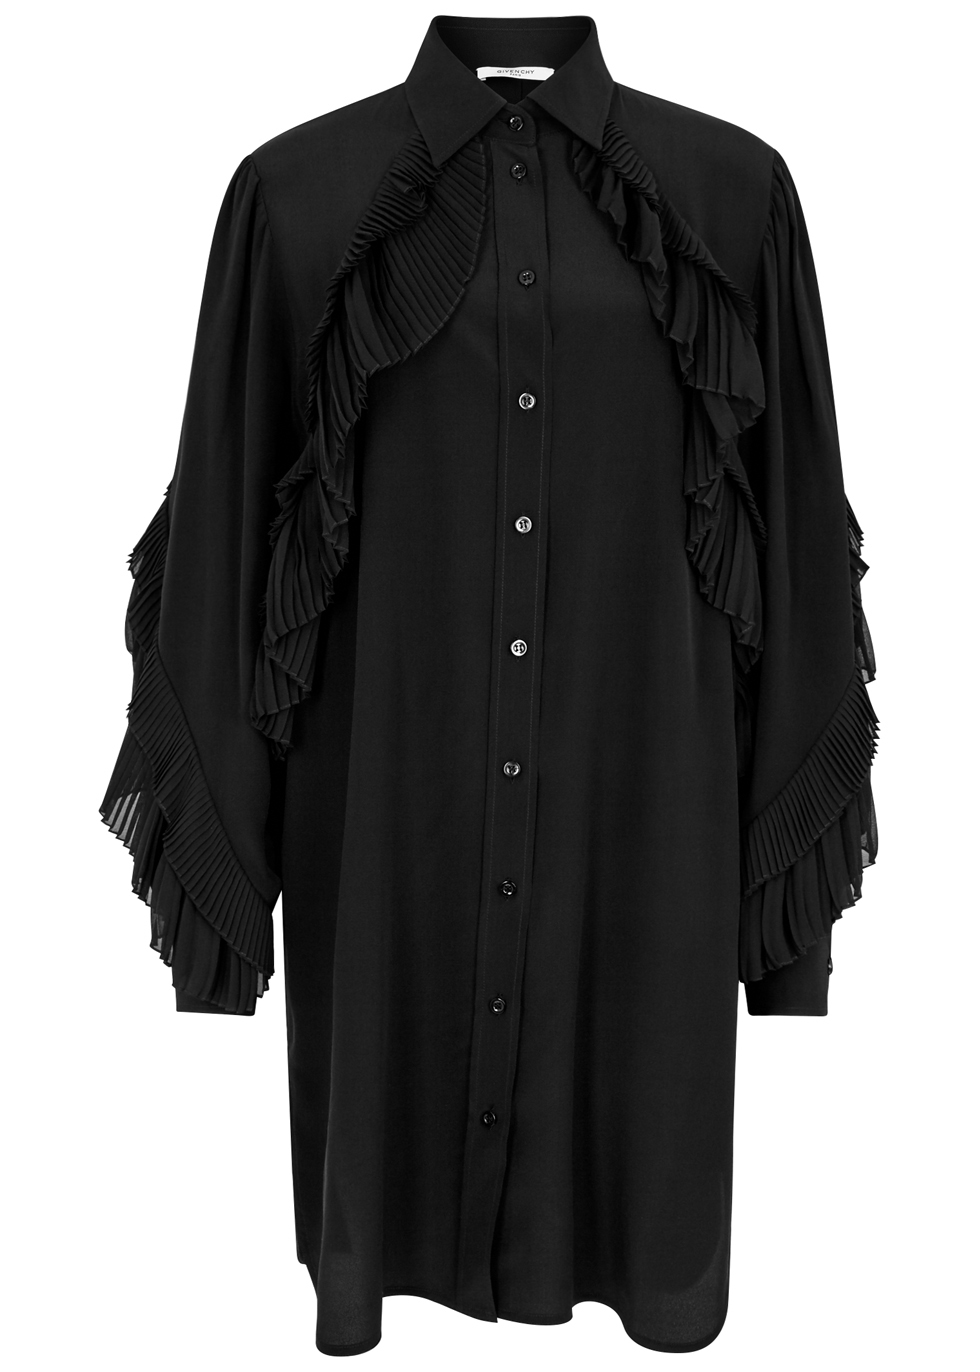 GIVENCHY BLACK RUFFLE-TRIMMED SILK DRESS